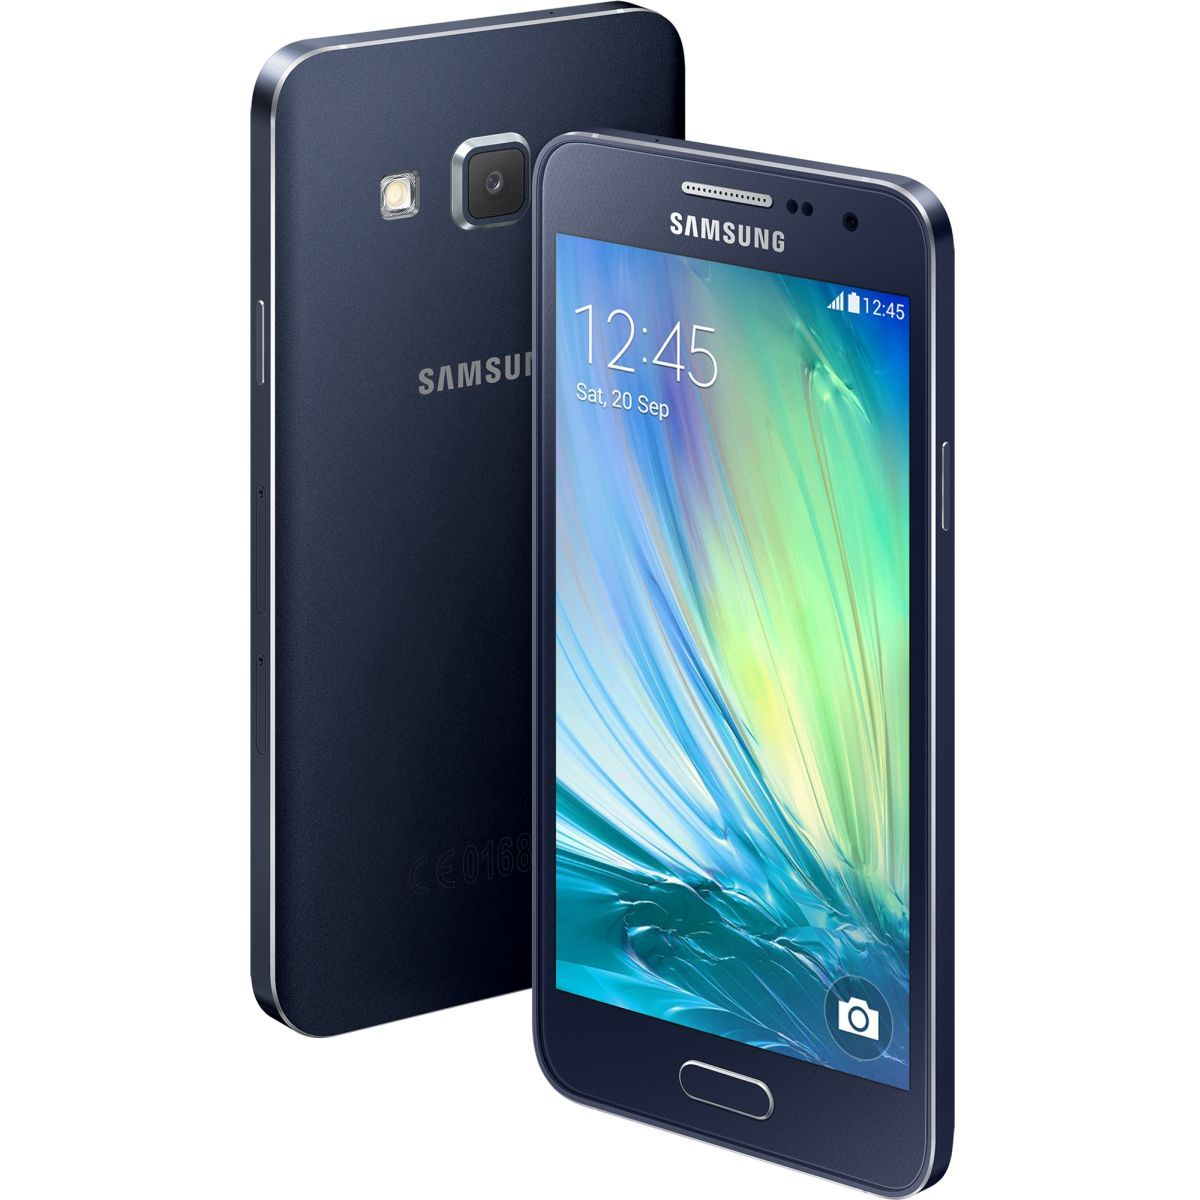 Samsung GALAXY A3 smartphoneul midrange dual SIM